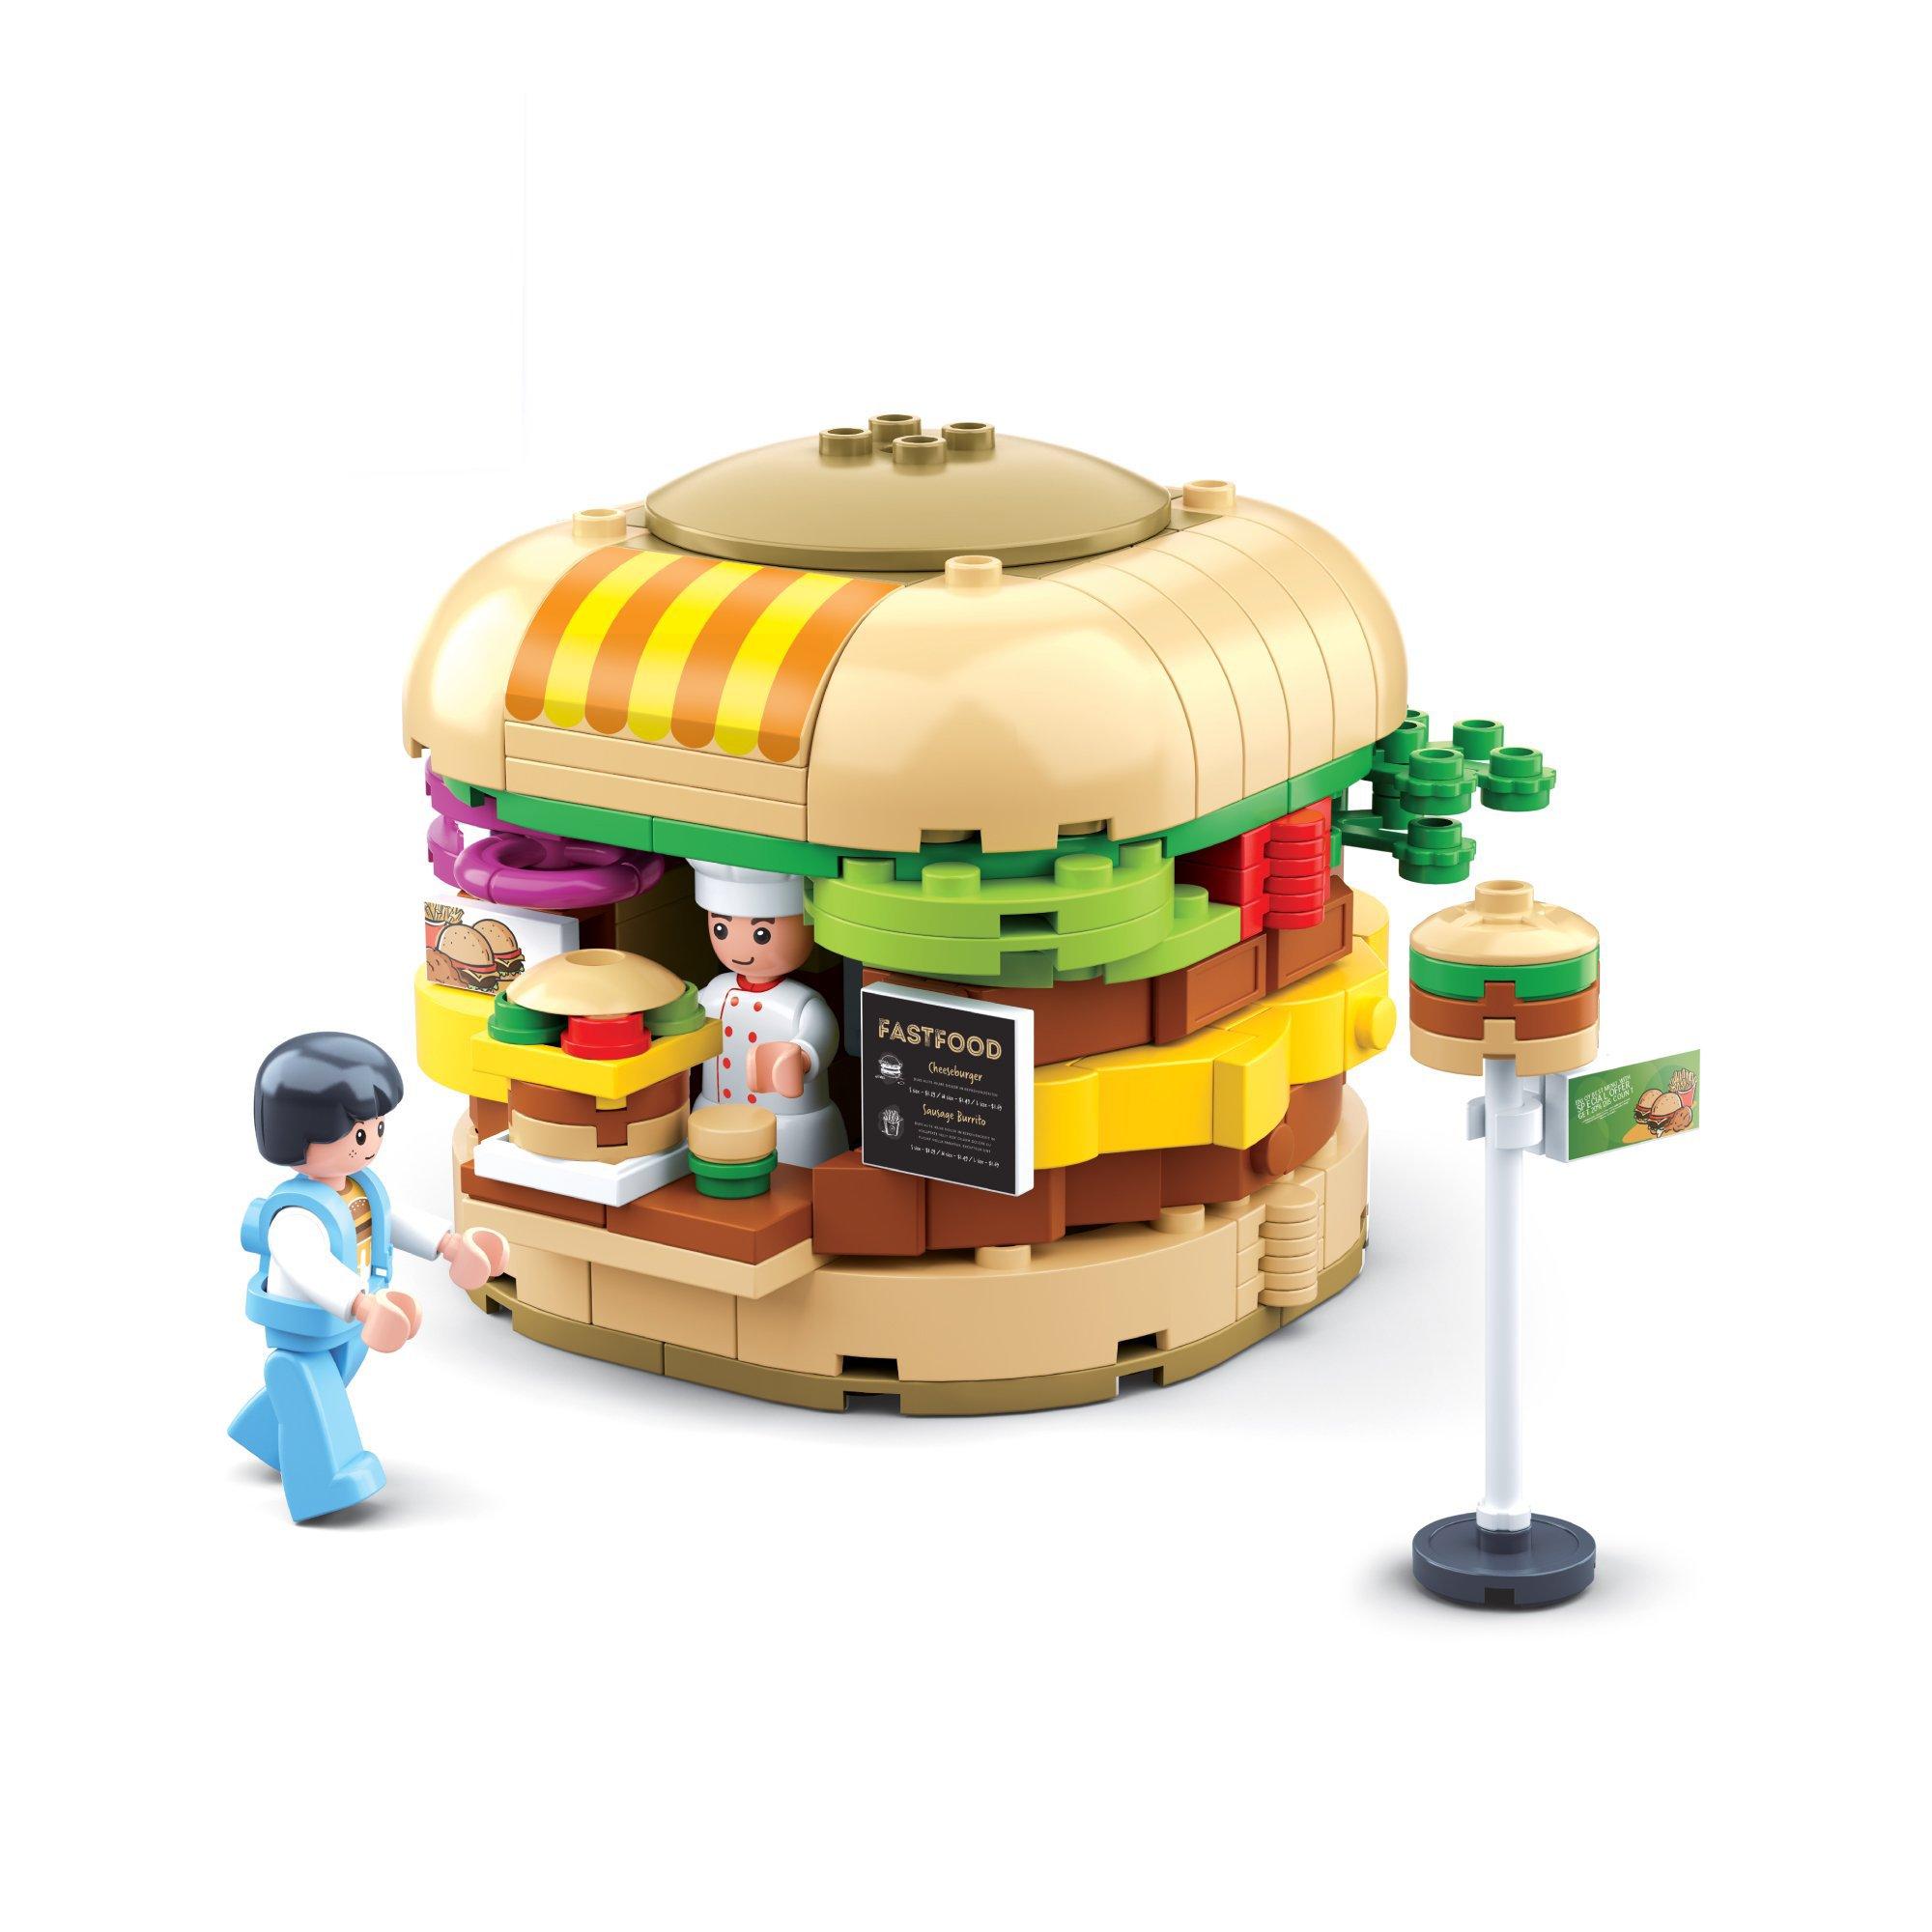 Đồ Chơi Lắp Ráp Quầy Hamburger TINITOY BRICK (276 pcs) (TN)